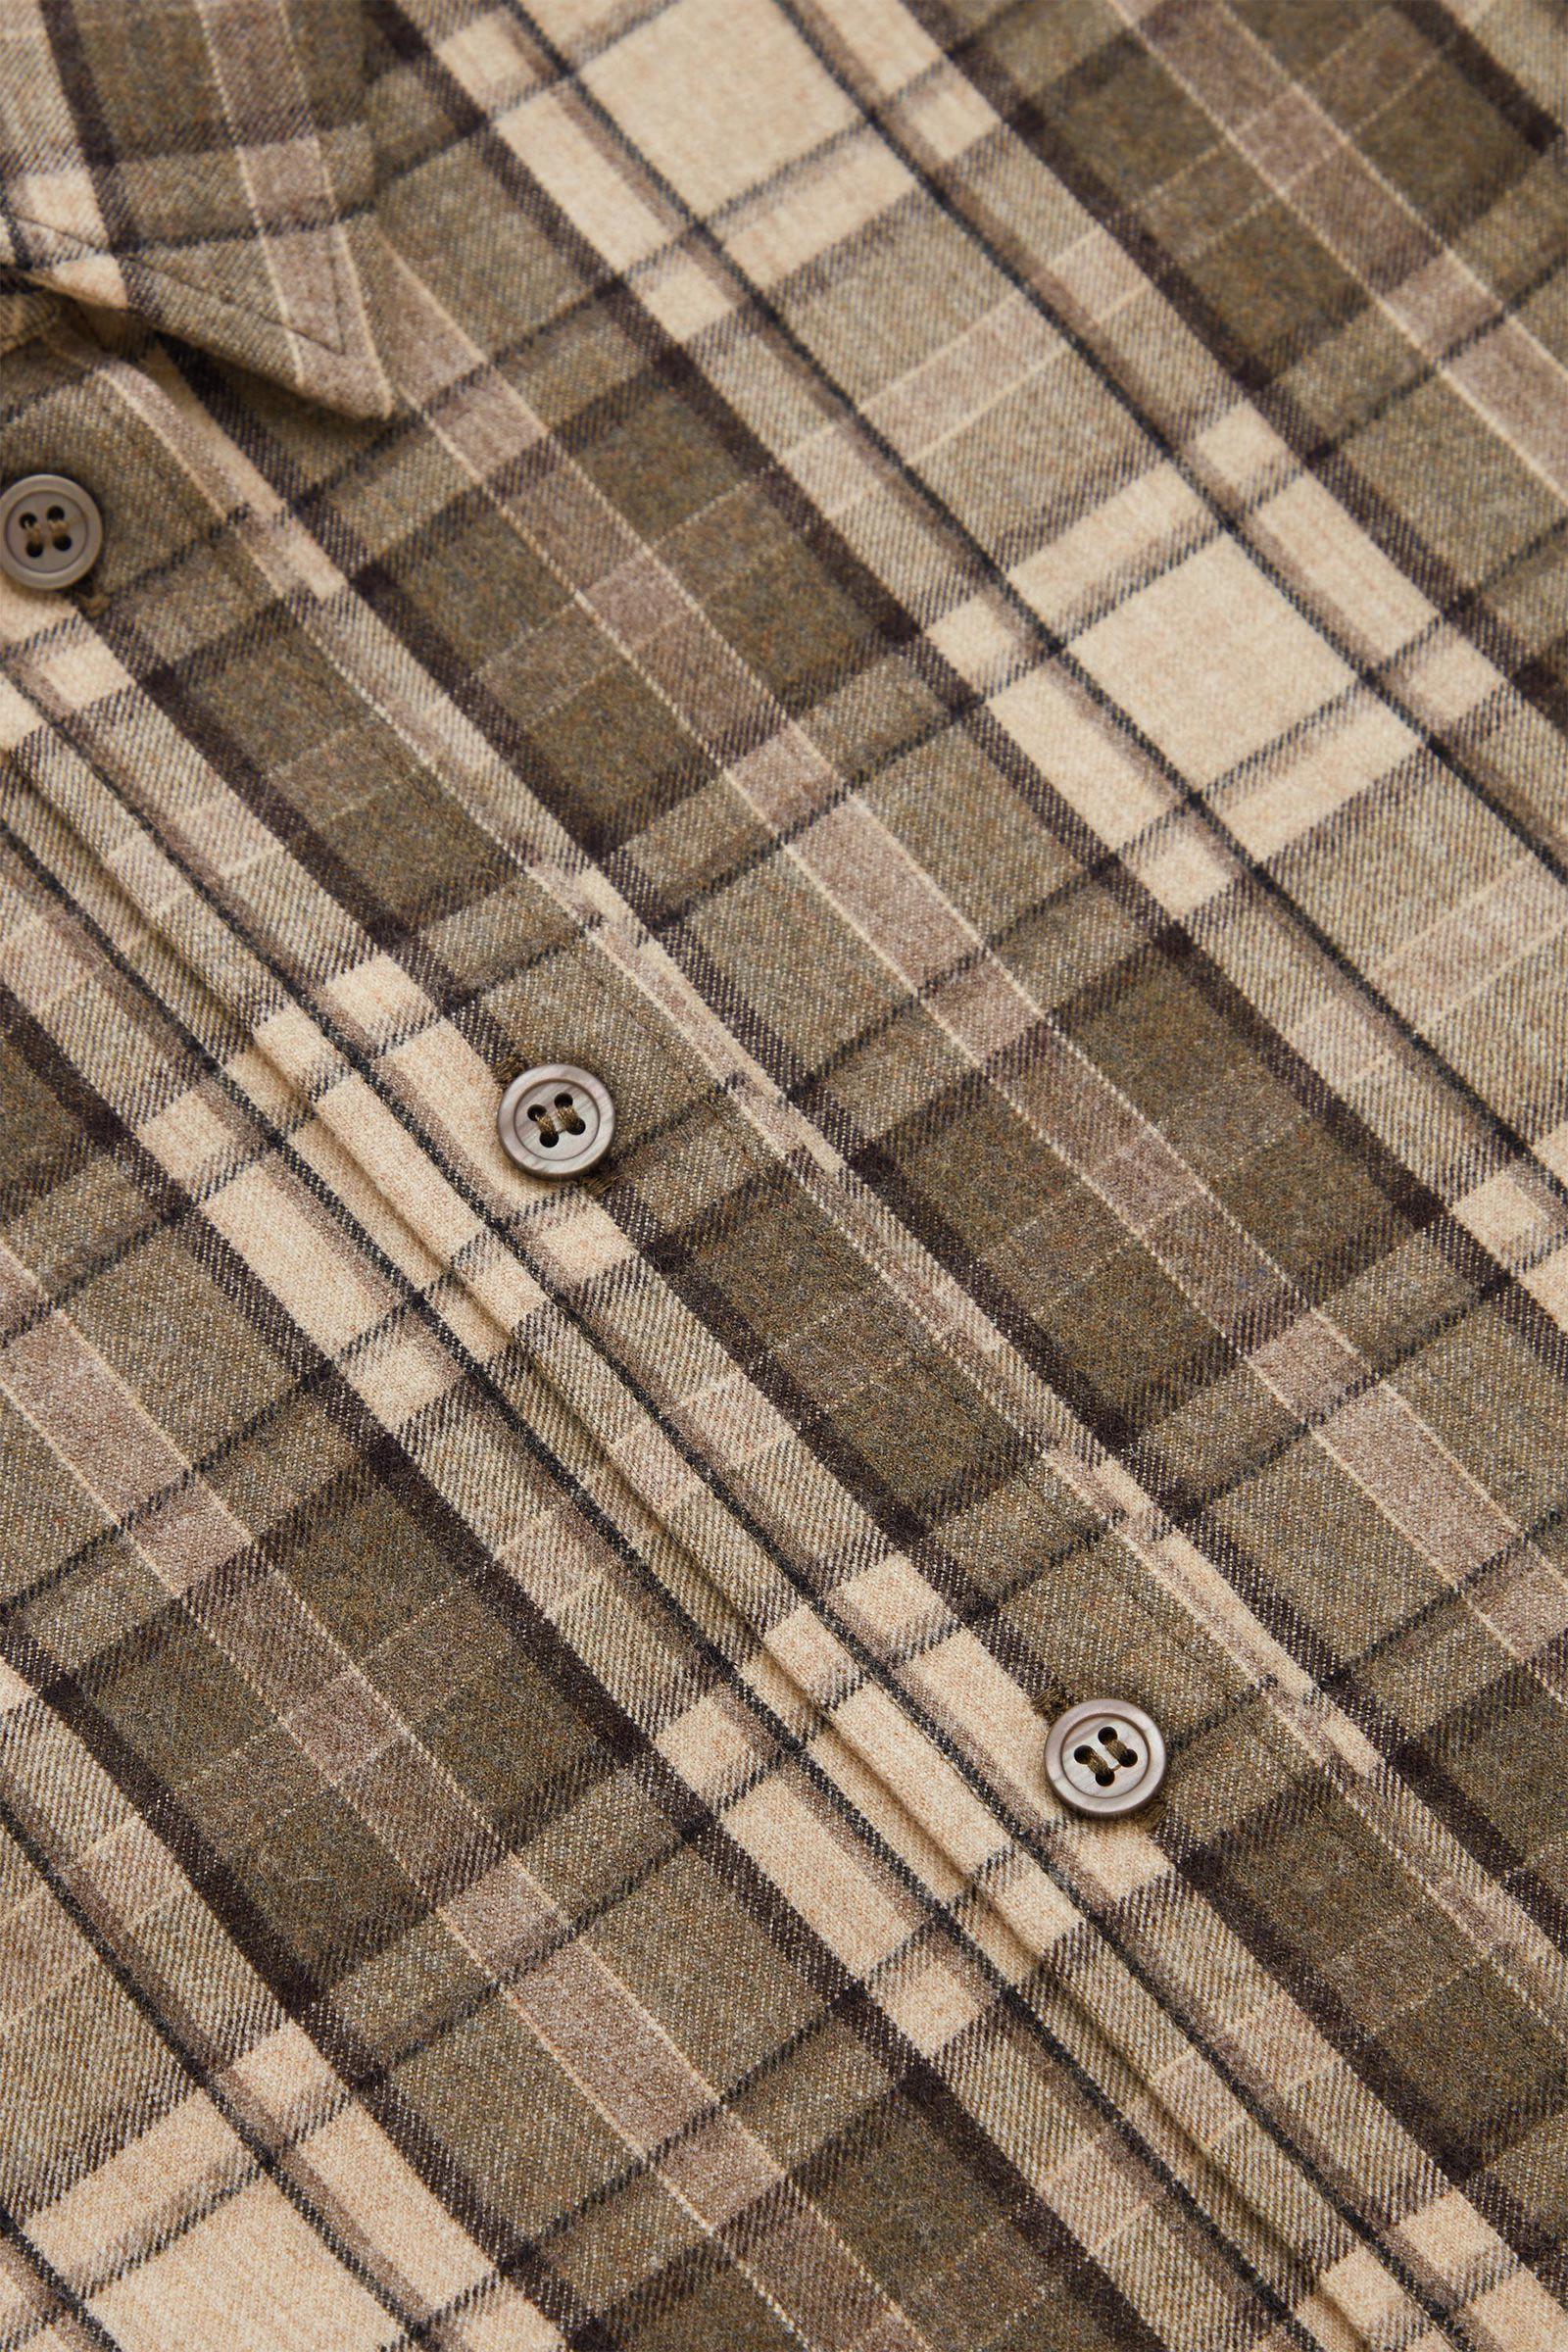 COS 체크 울 셔츠의 베이지 / 브라운컬러 Detail입니다.